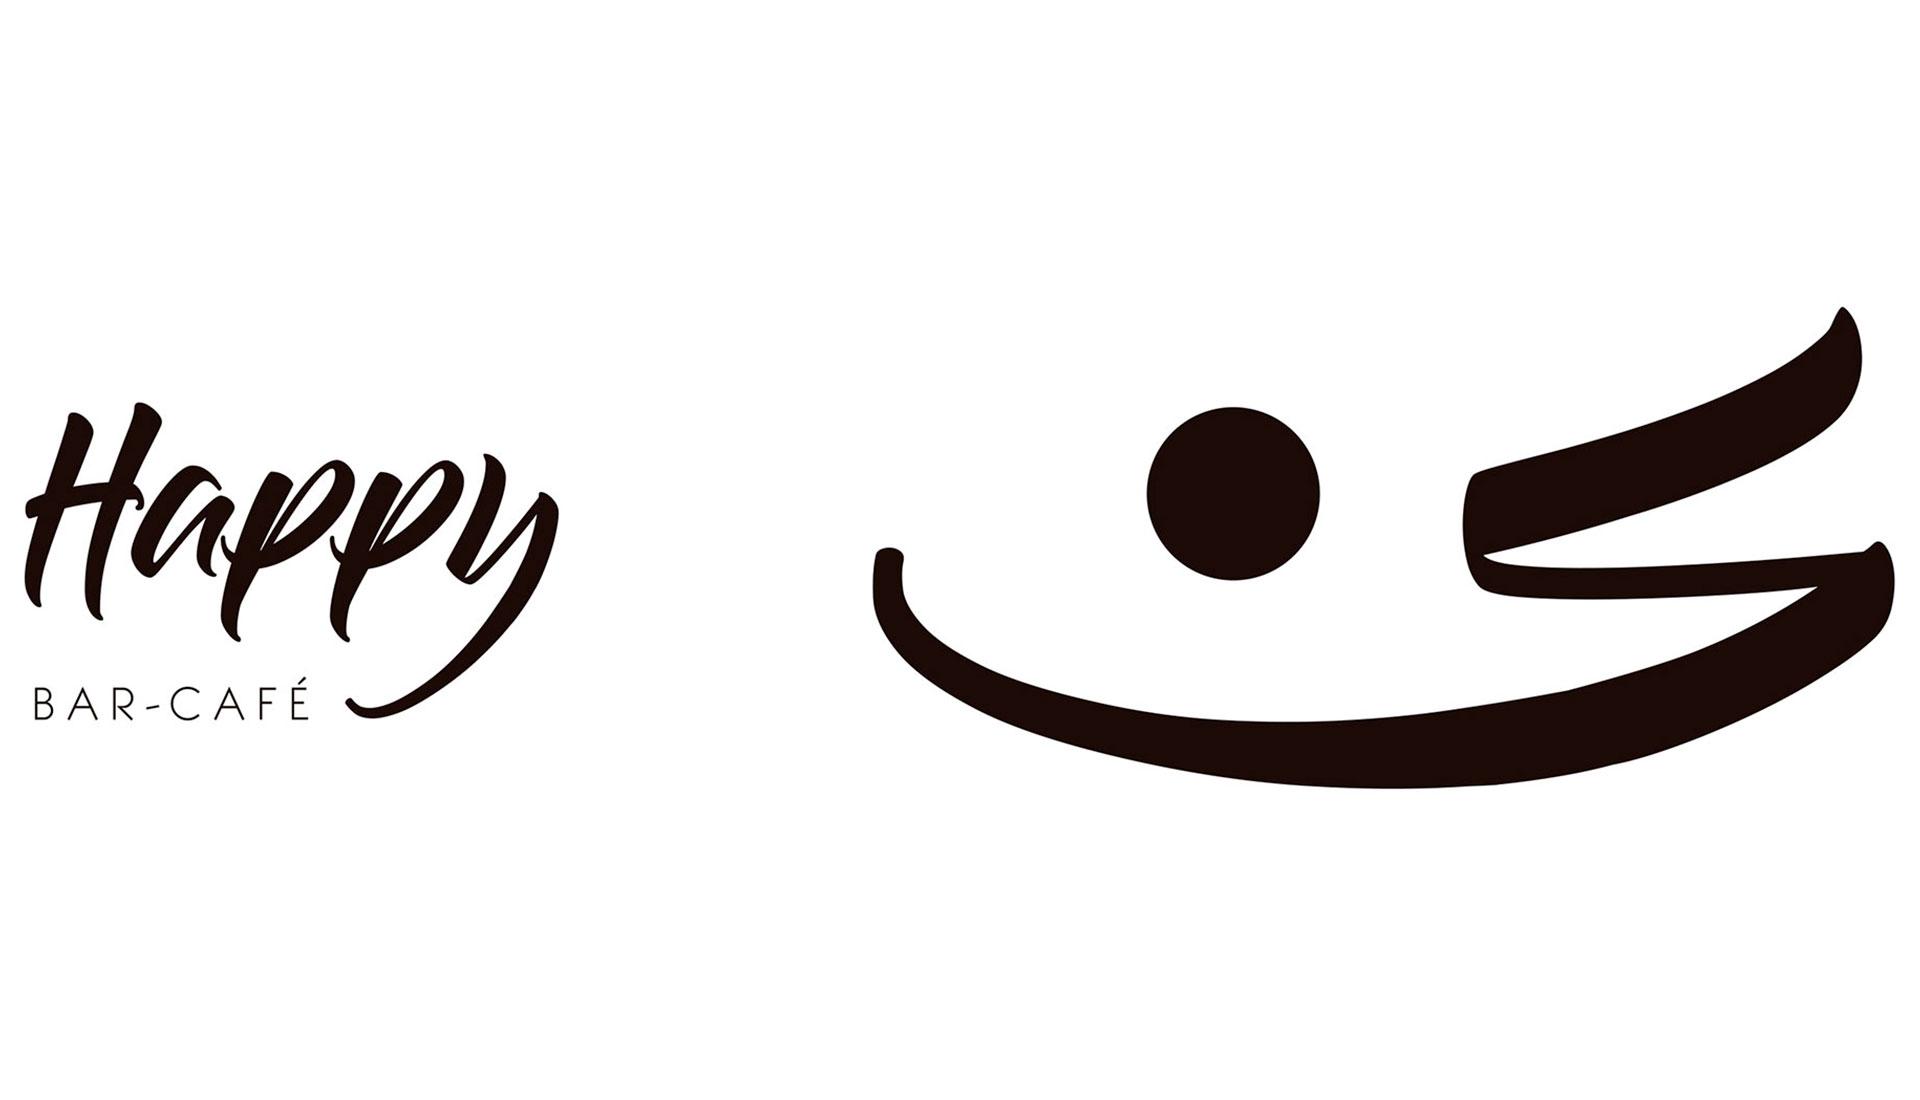 agencia-pennyworth-marketing-digital-identidad-corporativa-branding-restaurante-valencia-04